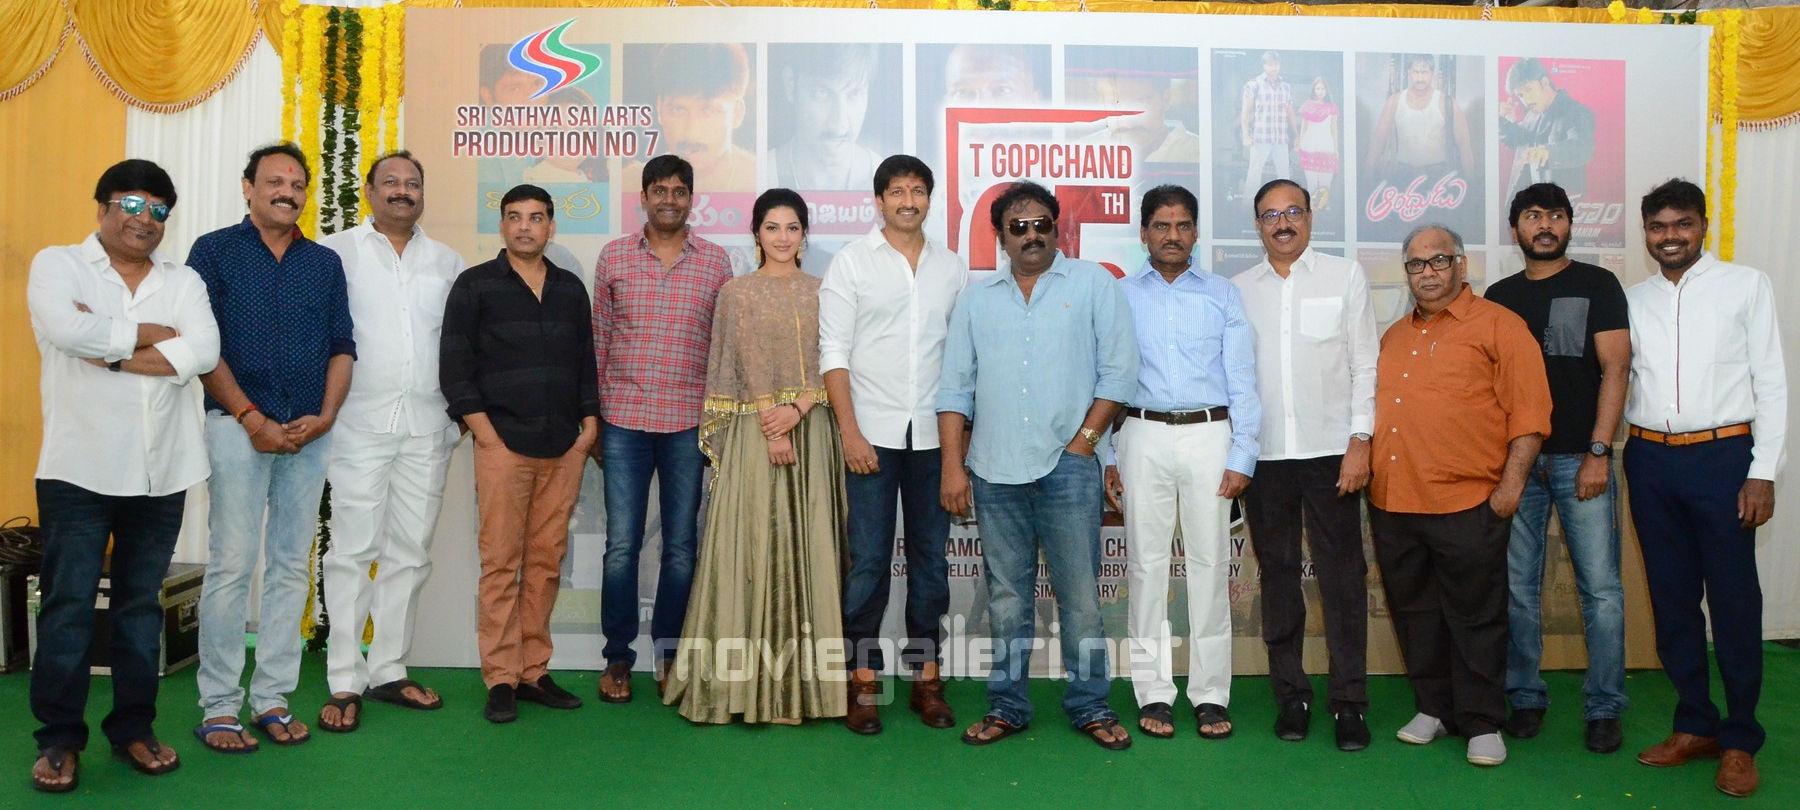 Gopichand's landmark 25th film with Sri Sathya Sai Arts launched